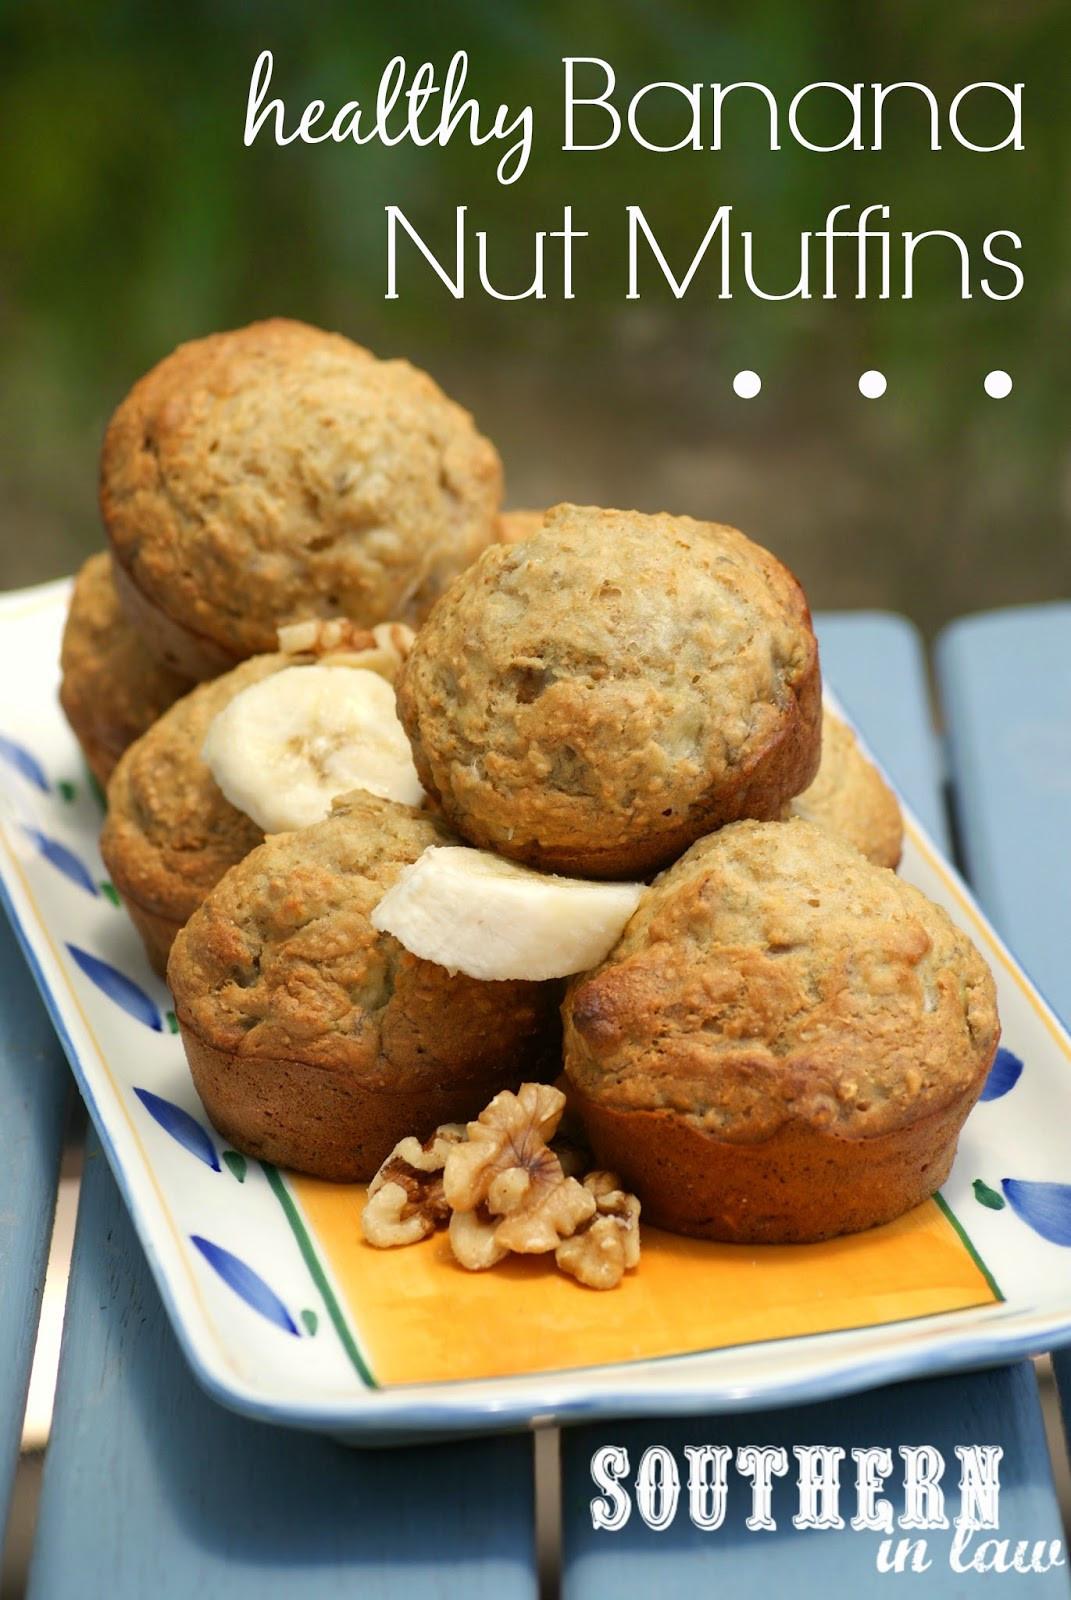 Healthy Banana Recipes  Southern In Law Recipe Healthy Banana Nut Muffins